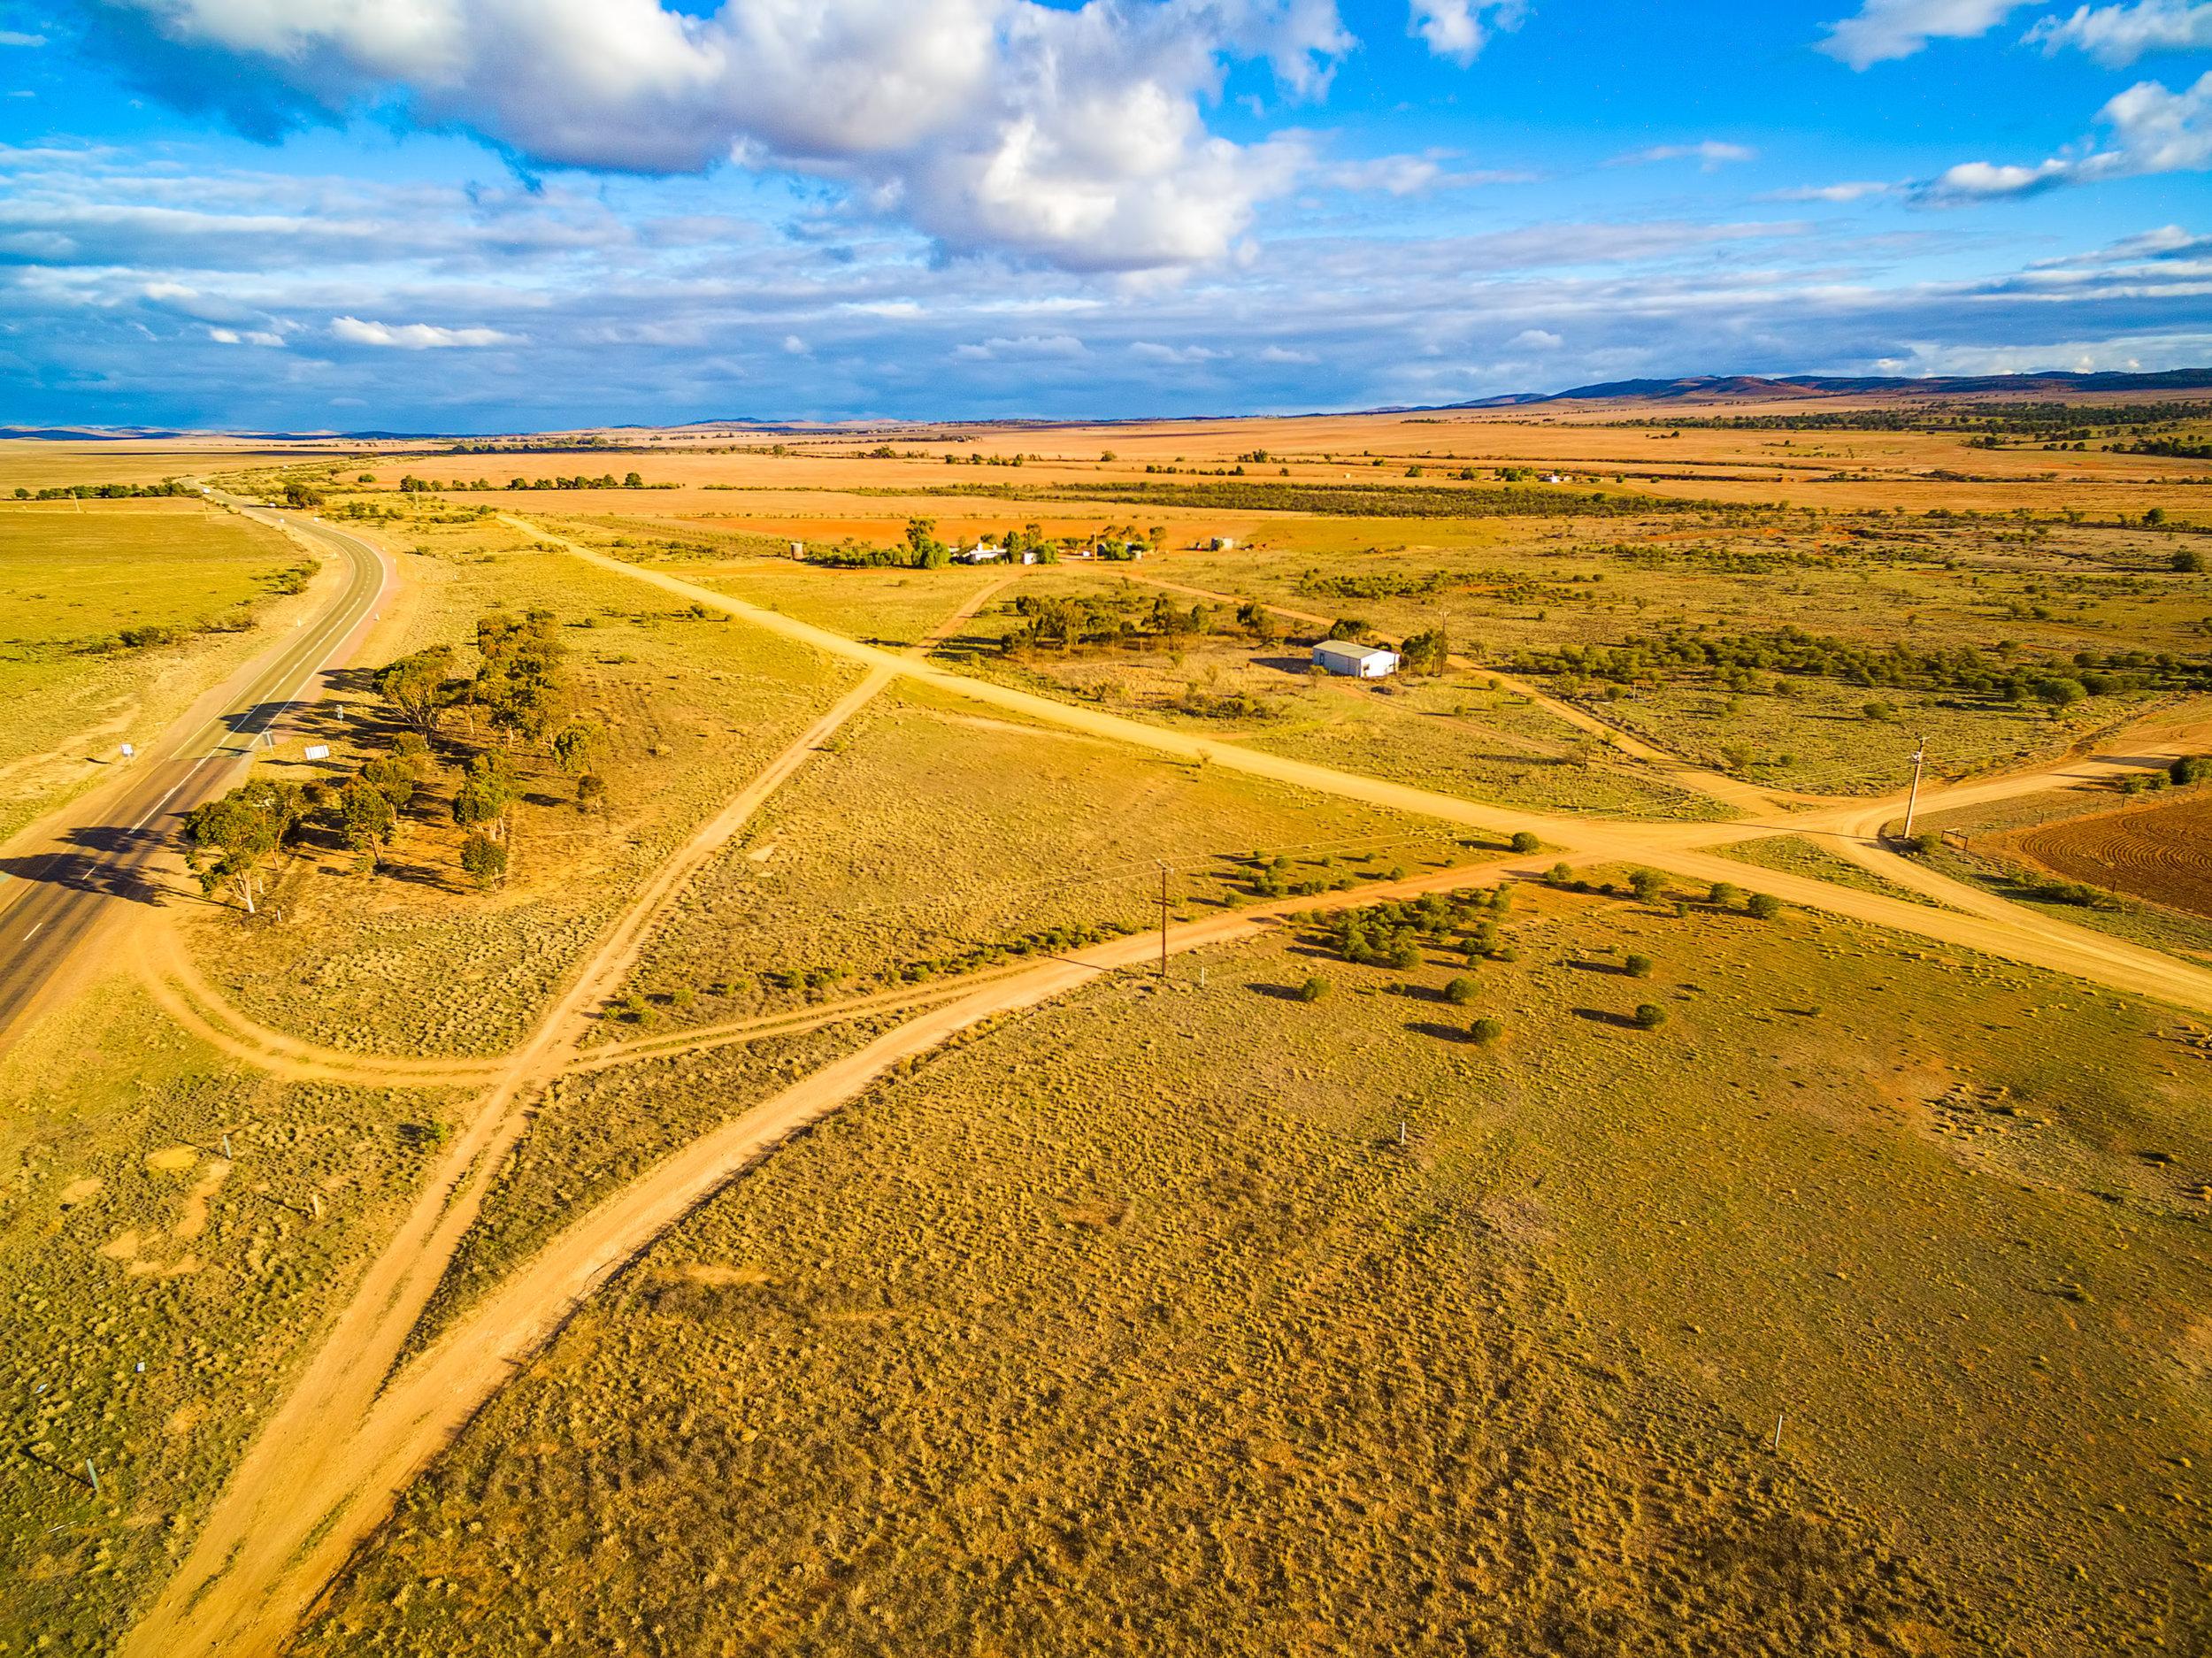 bigstock-Aerial-Landscape-Of-Pastures-A-251898598.jpg